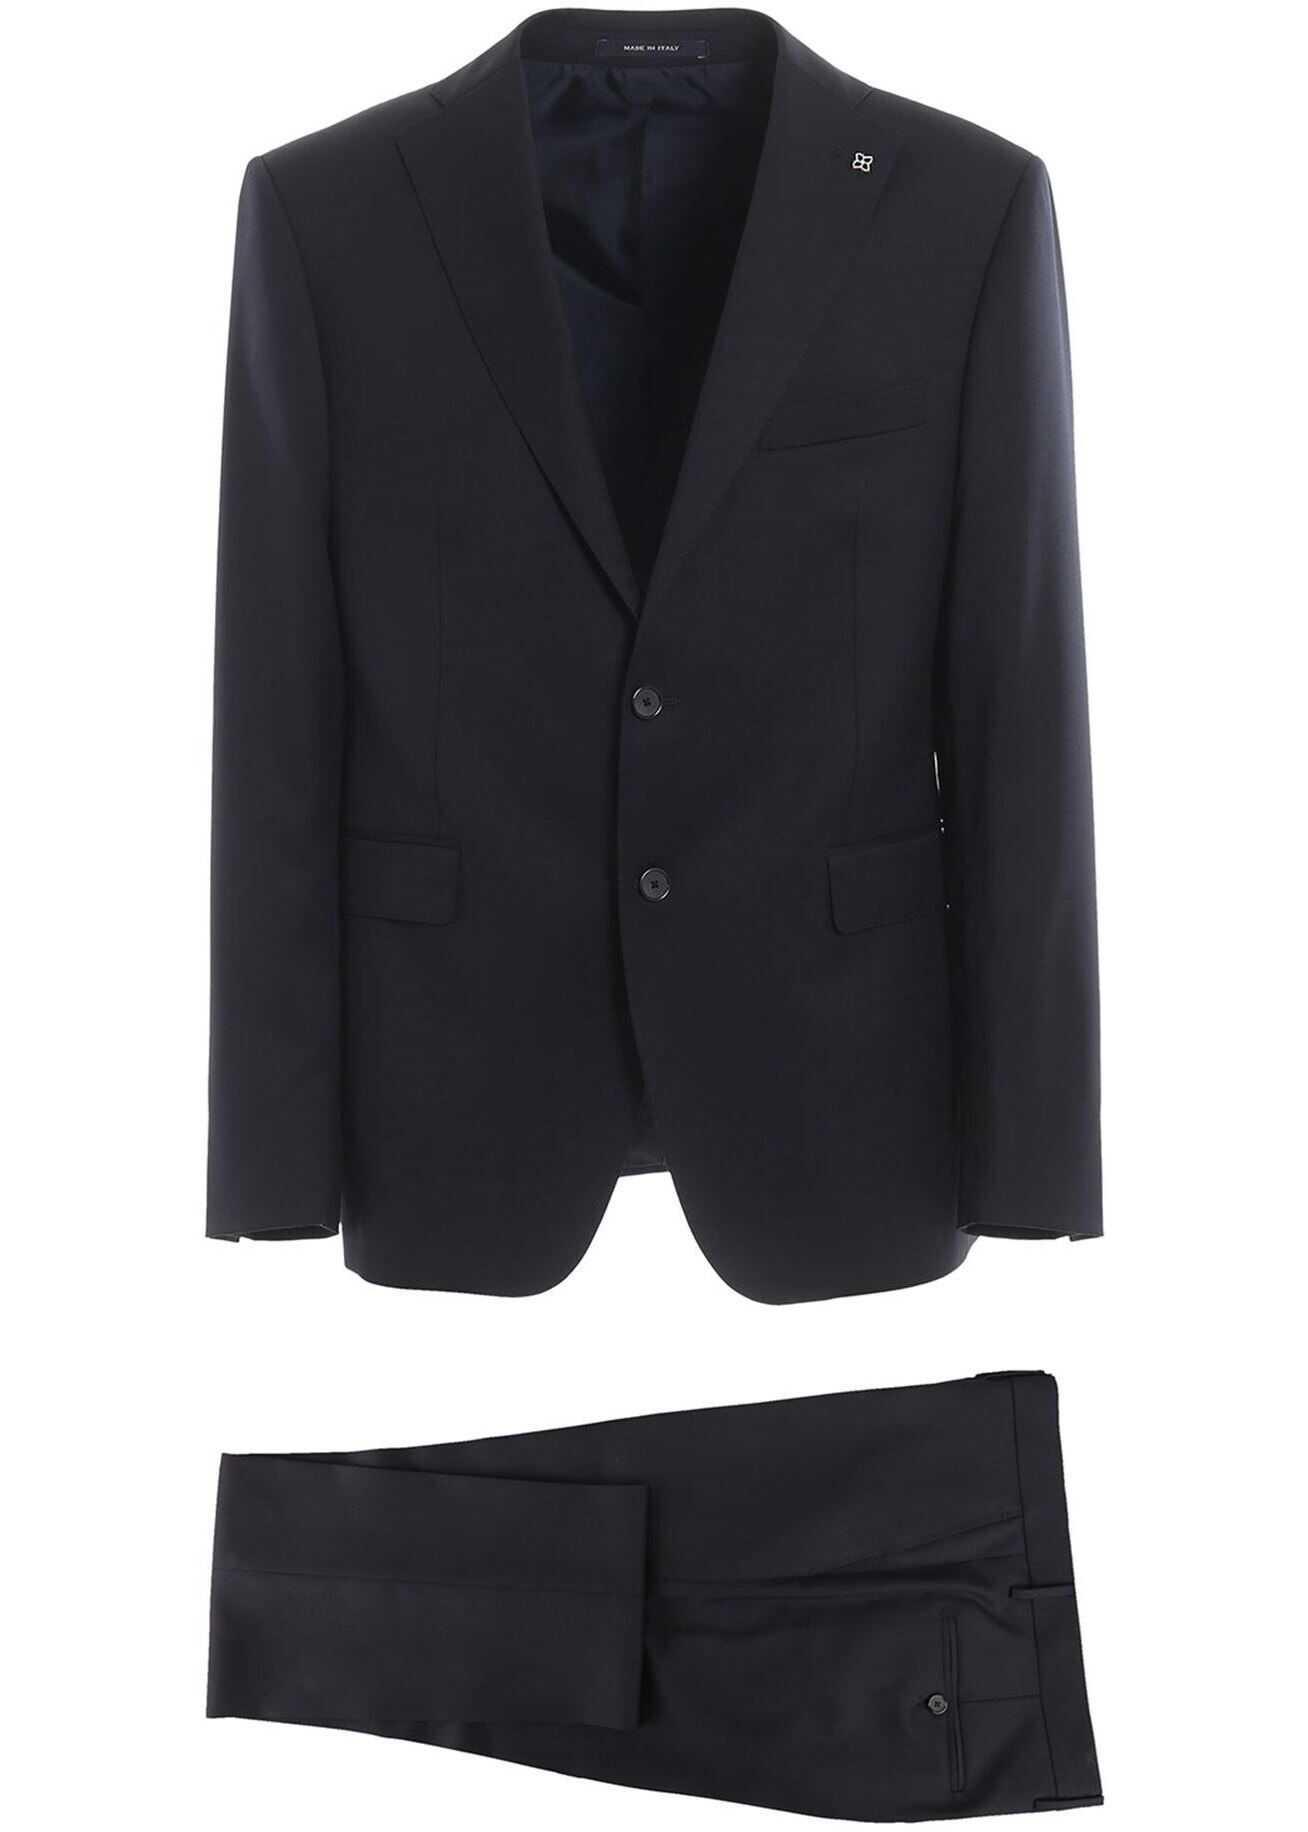 Tagliatore Super 110'S Virgin Wool Two-Piece Suit In Blue Blue imagine